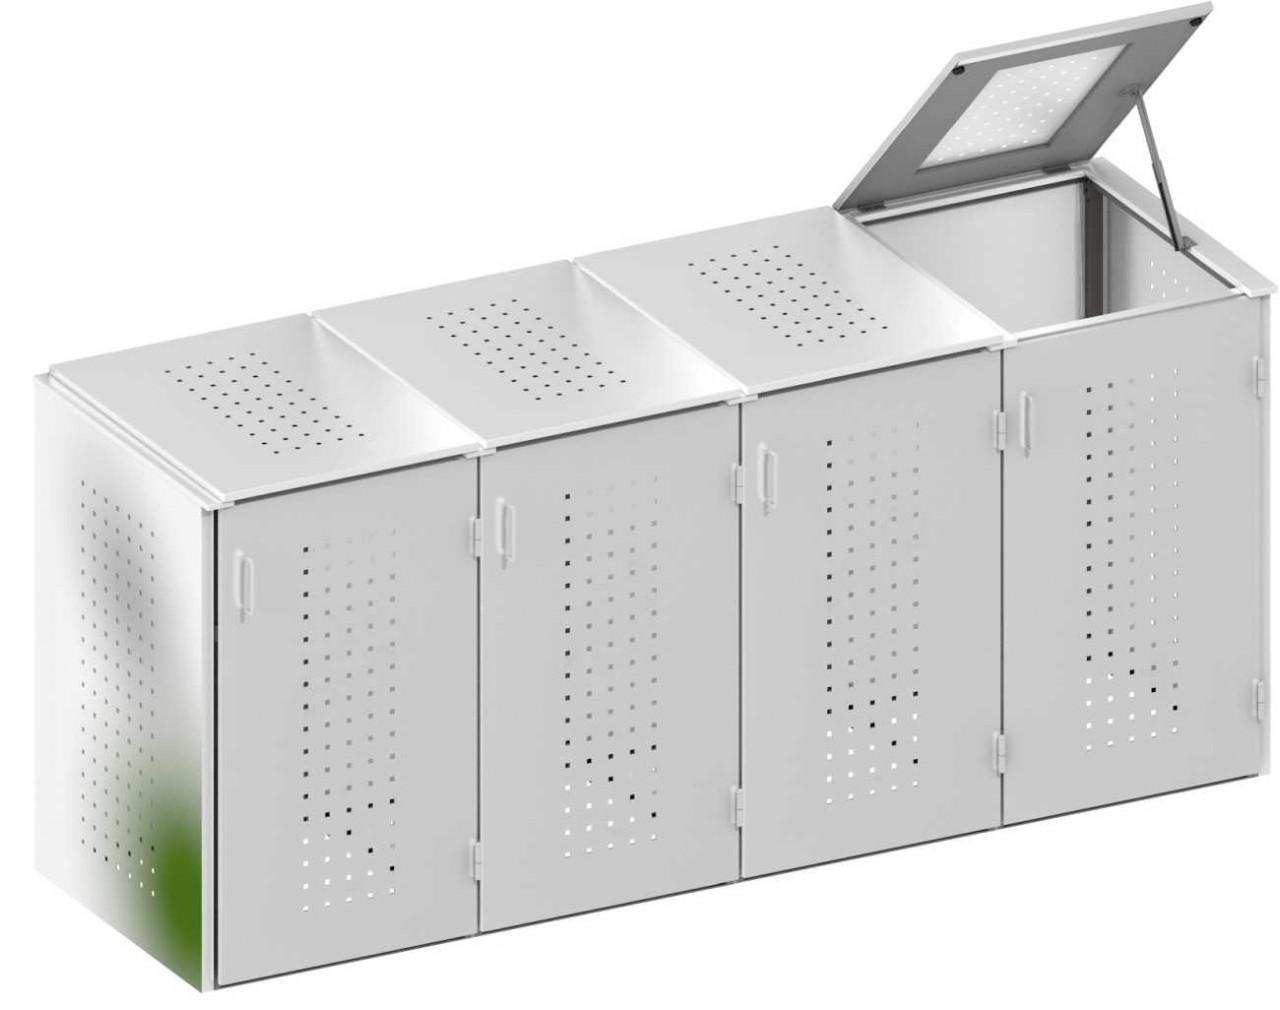 Müllbox Binto Edelstahl 4er